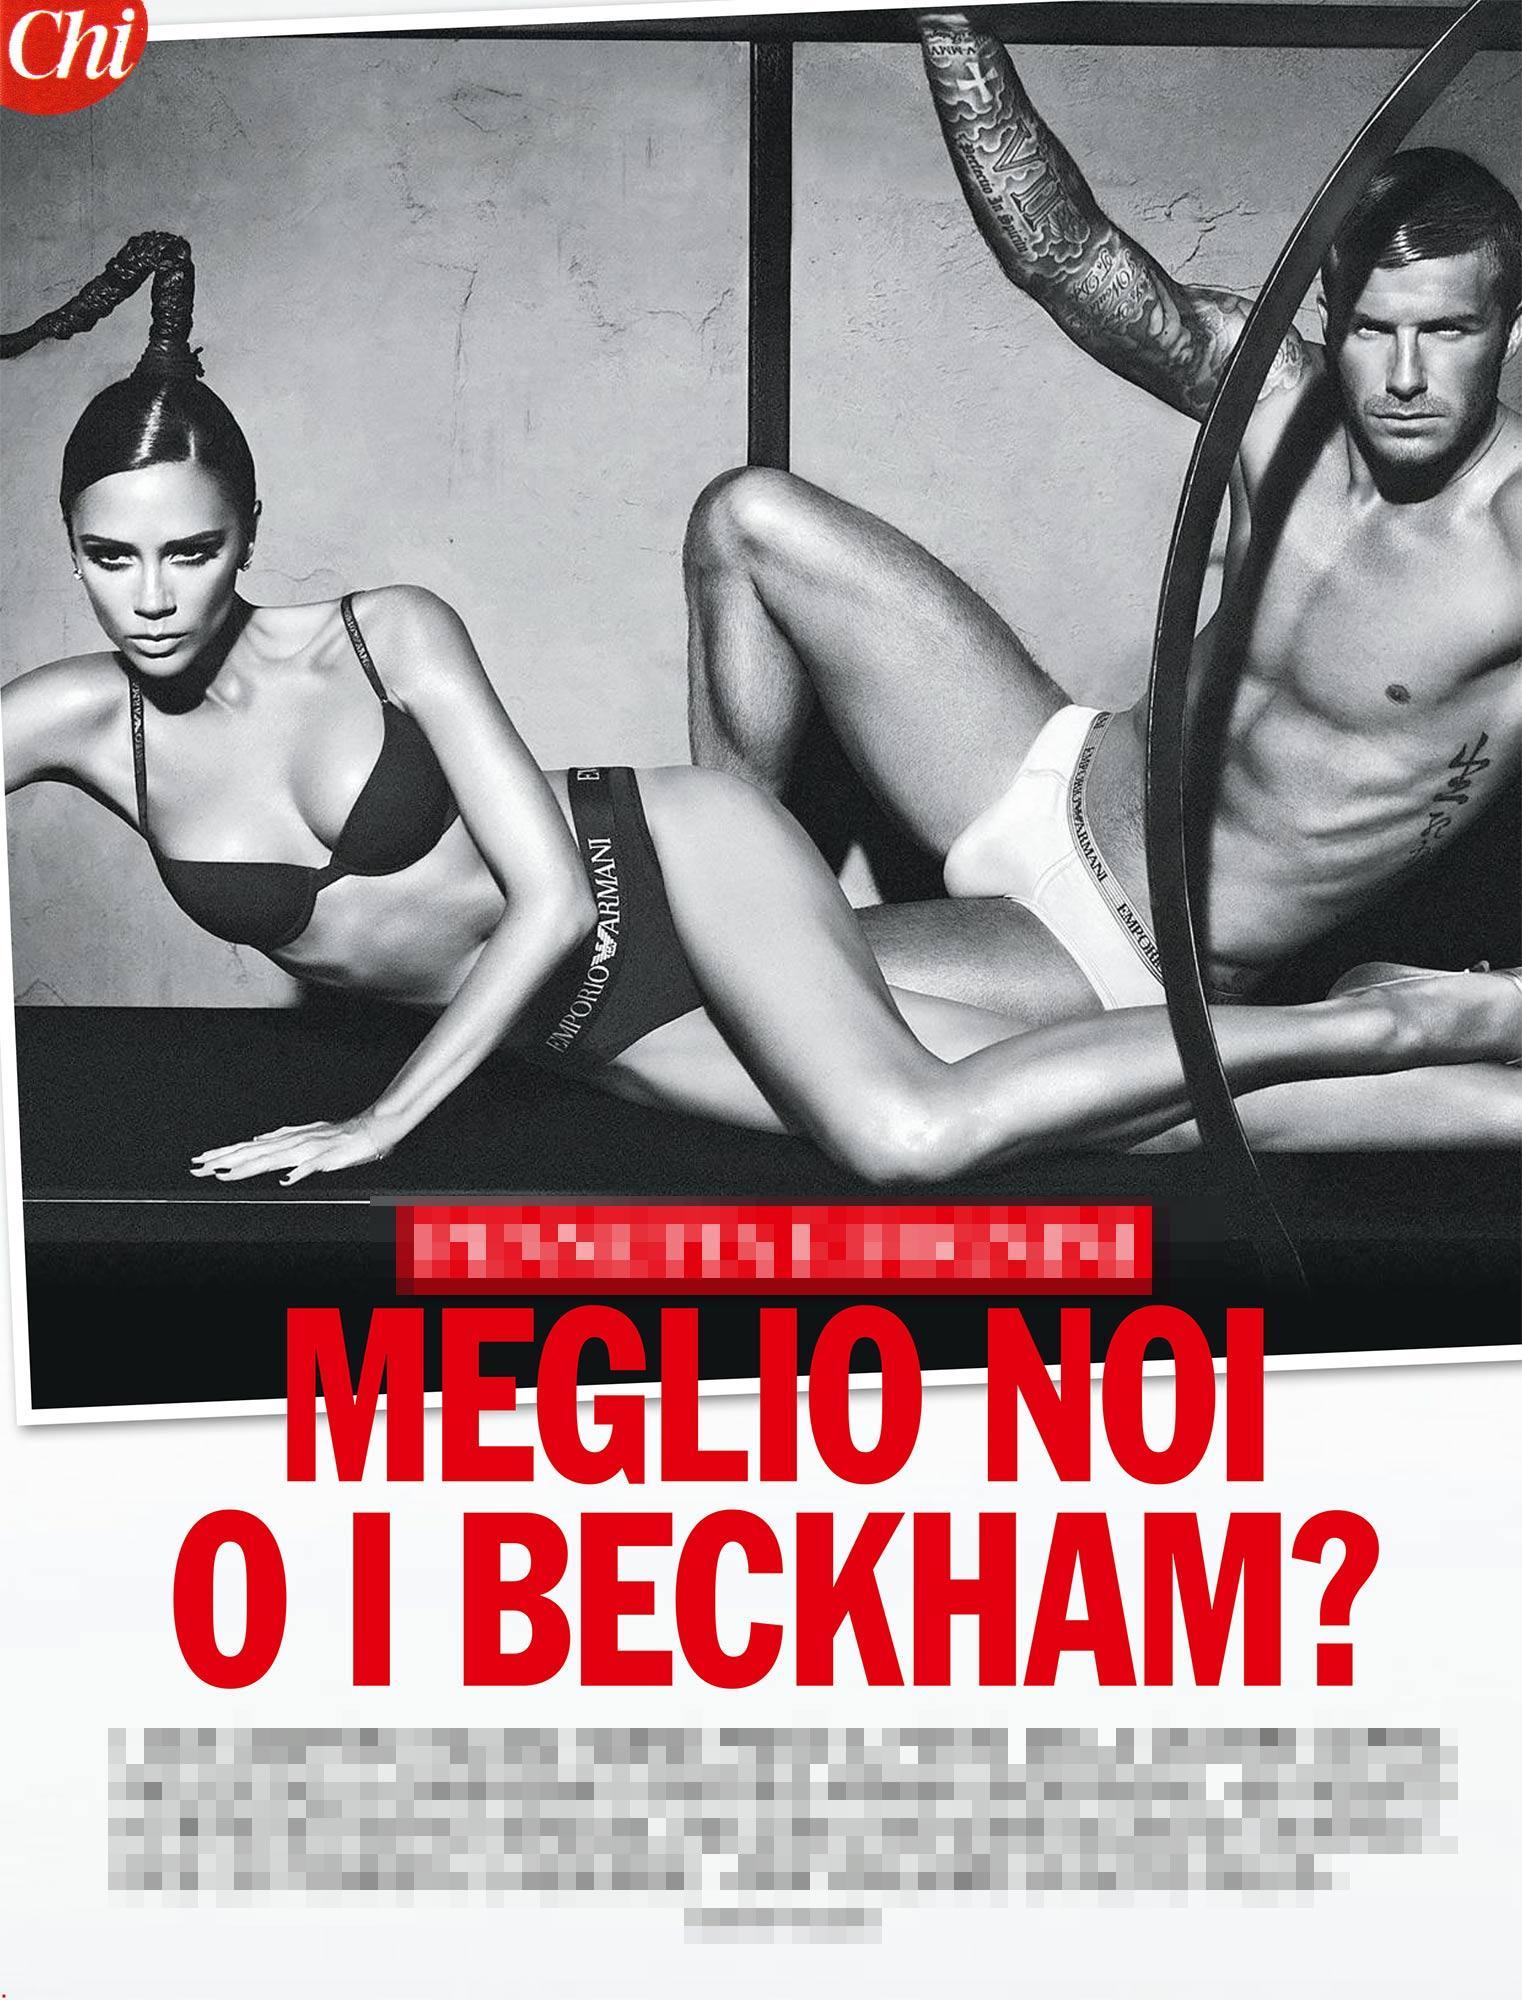 Pennetta e Fognini, in lingerie come i Beckham